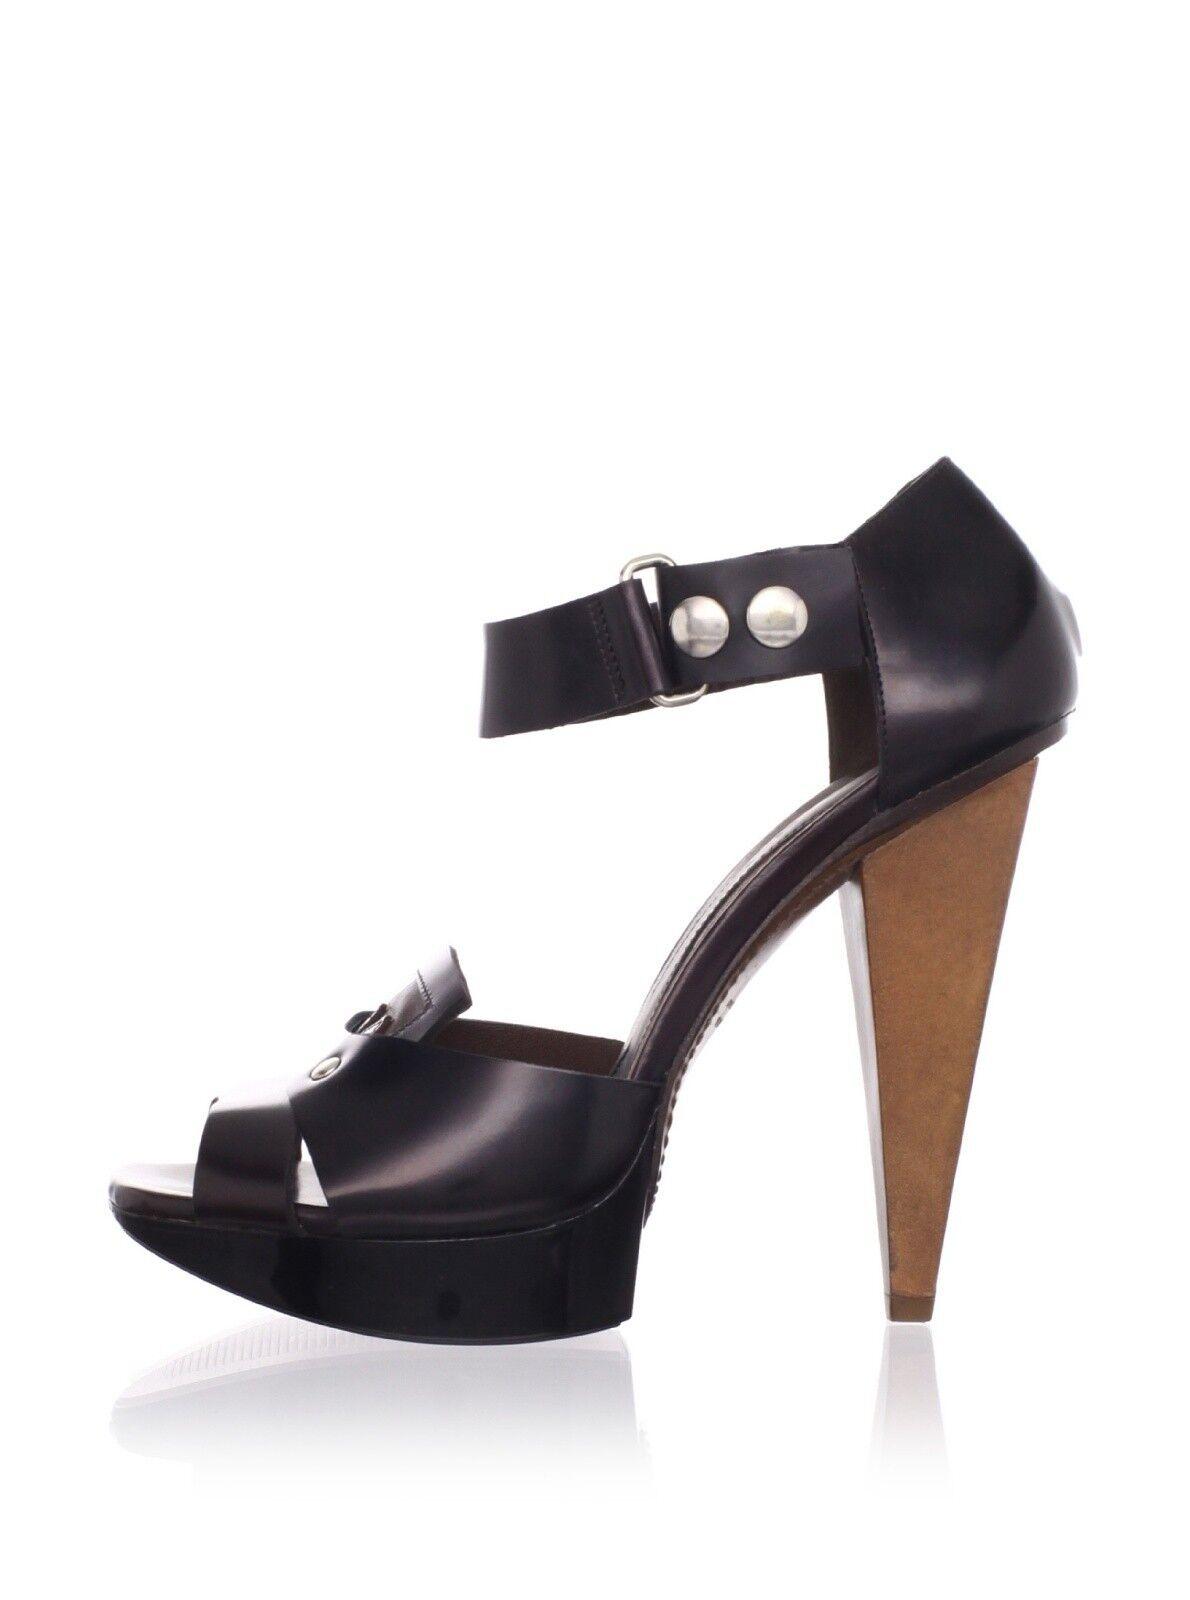 NEW Marni Ankle-Strap EU Platform Sandale sz 38,5 EU Ankle-Strap 8 US 9ffee7